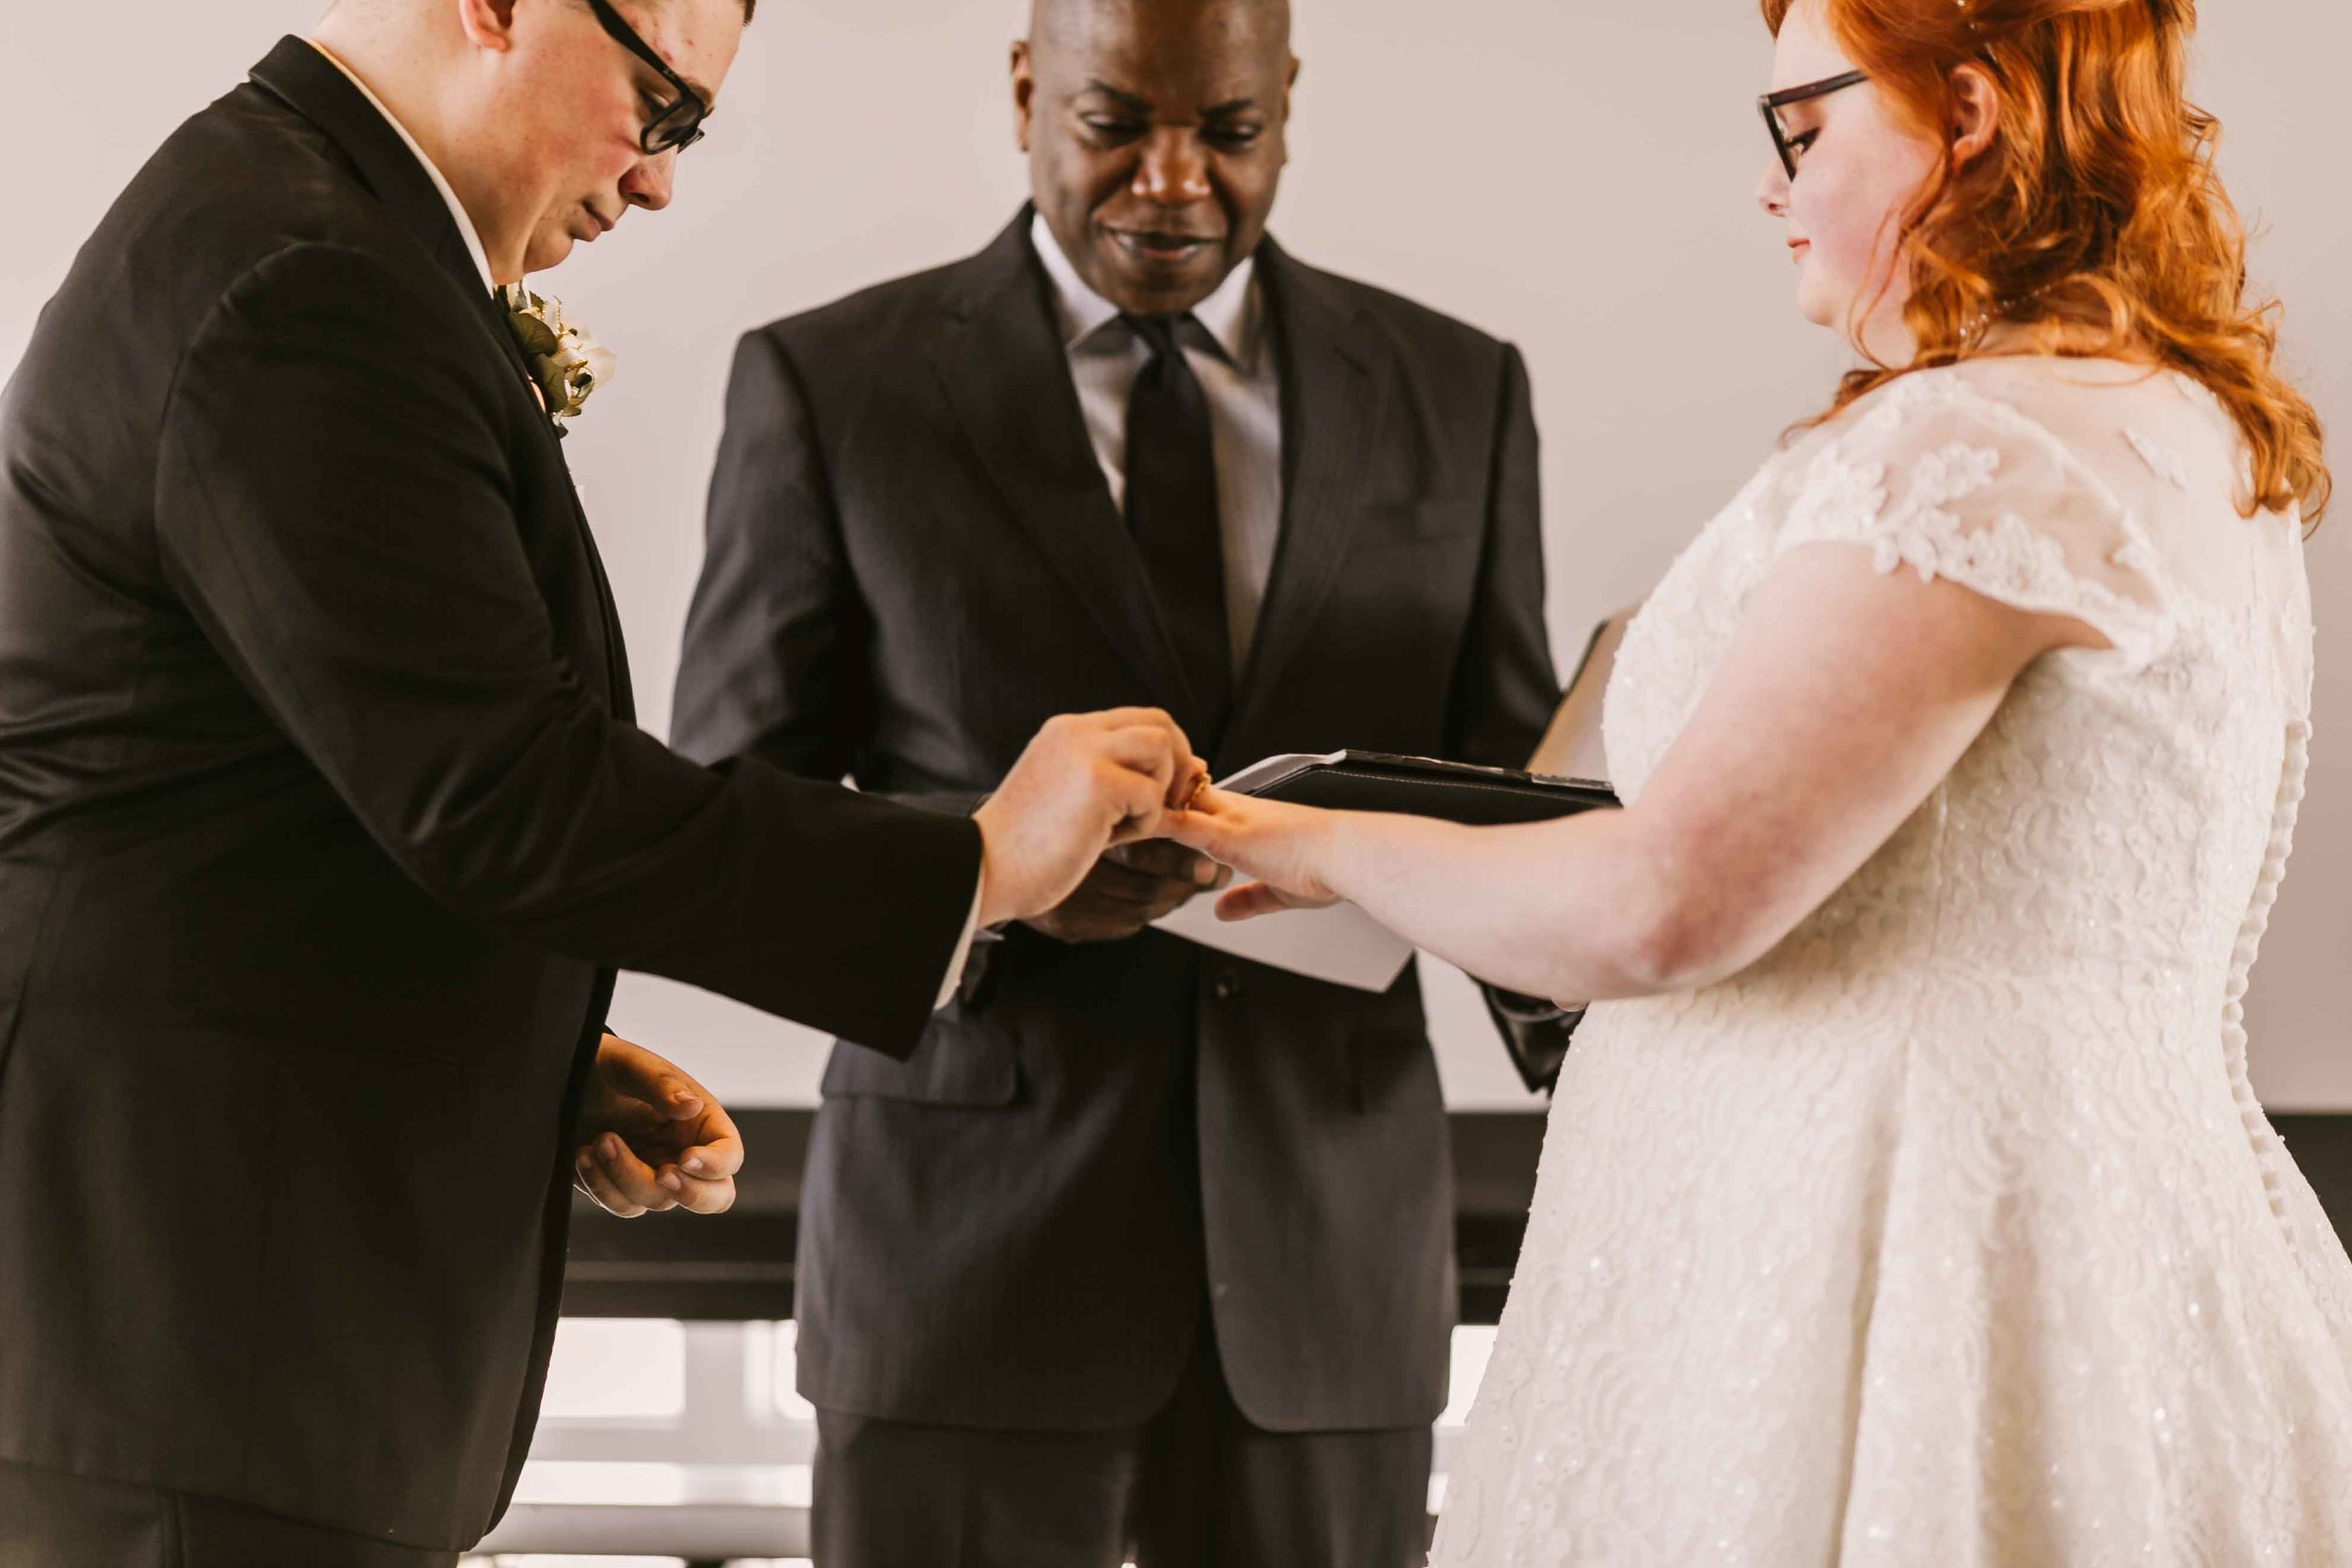 richland-wedding-photographer-32.jpg